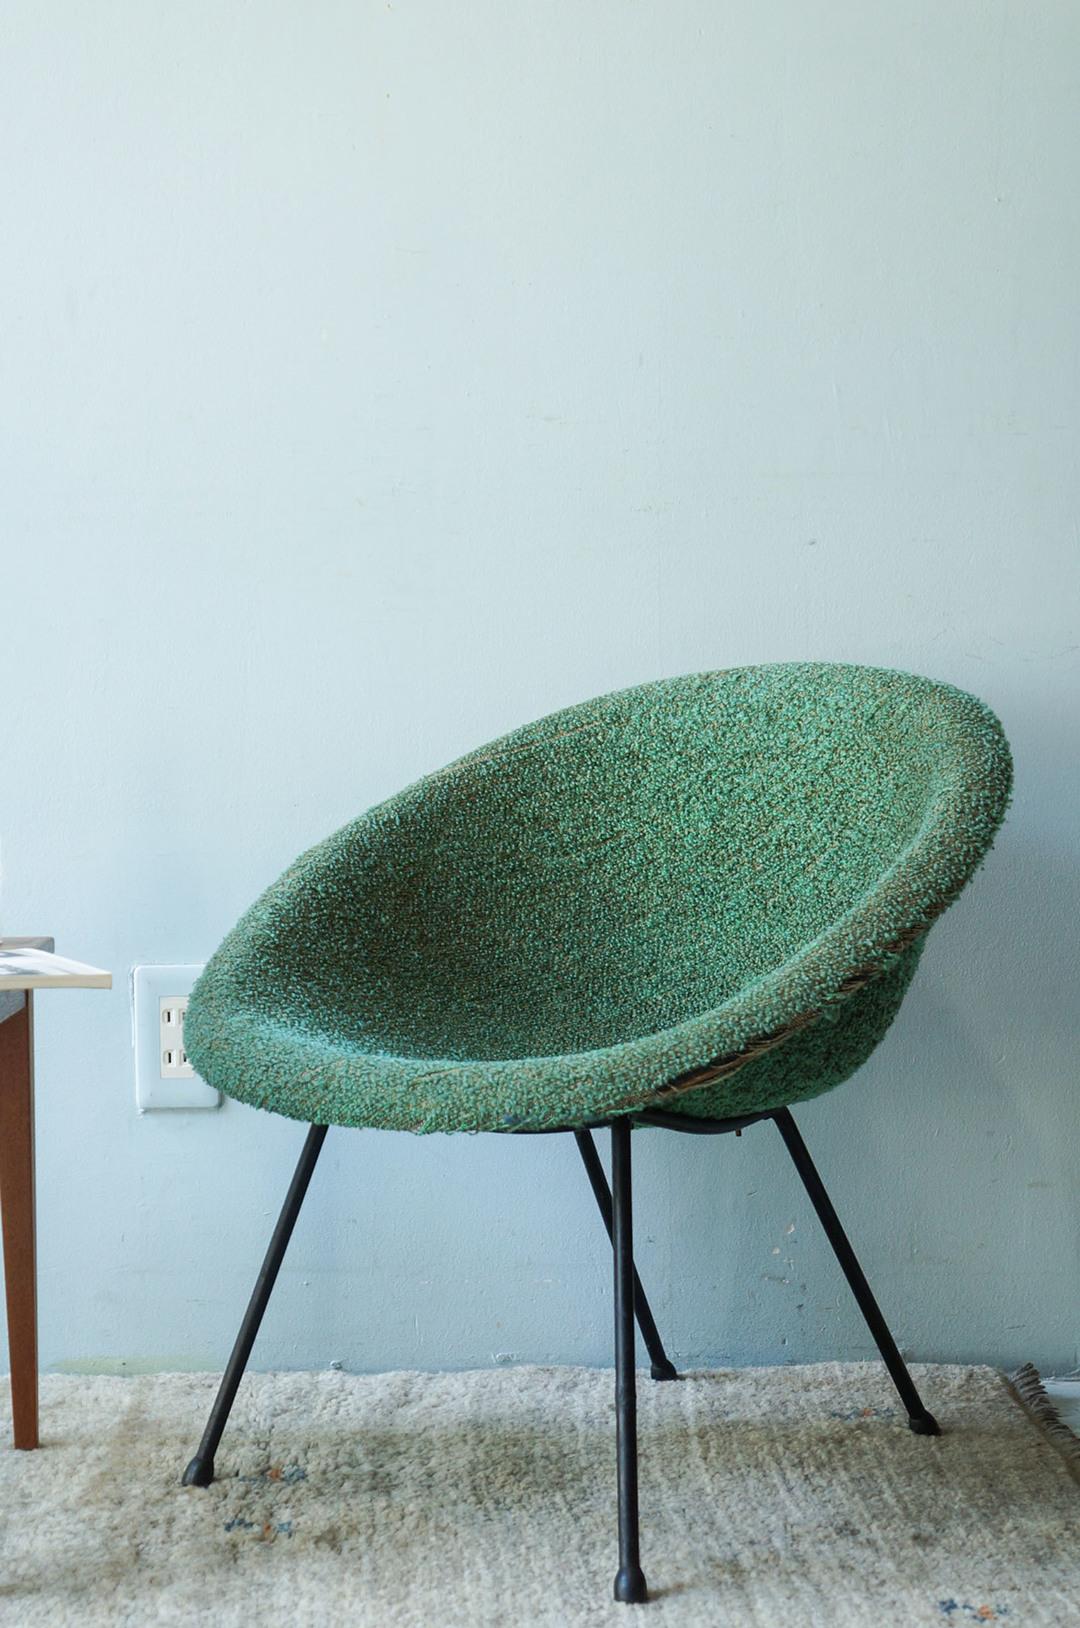 Midcentury Vintage Hoop Chair/ミッドセンチュリー ヴィンテージ フープチェア 椅子 インテリア レトロ